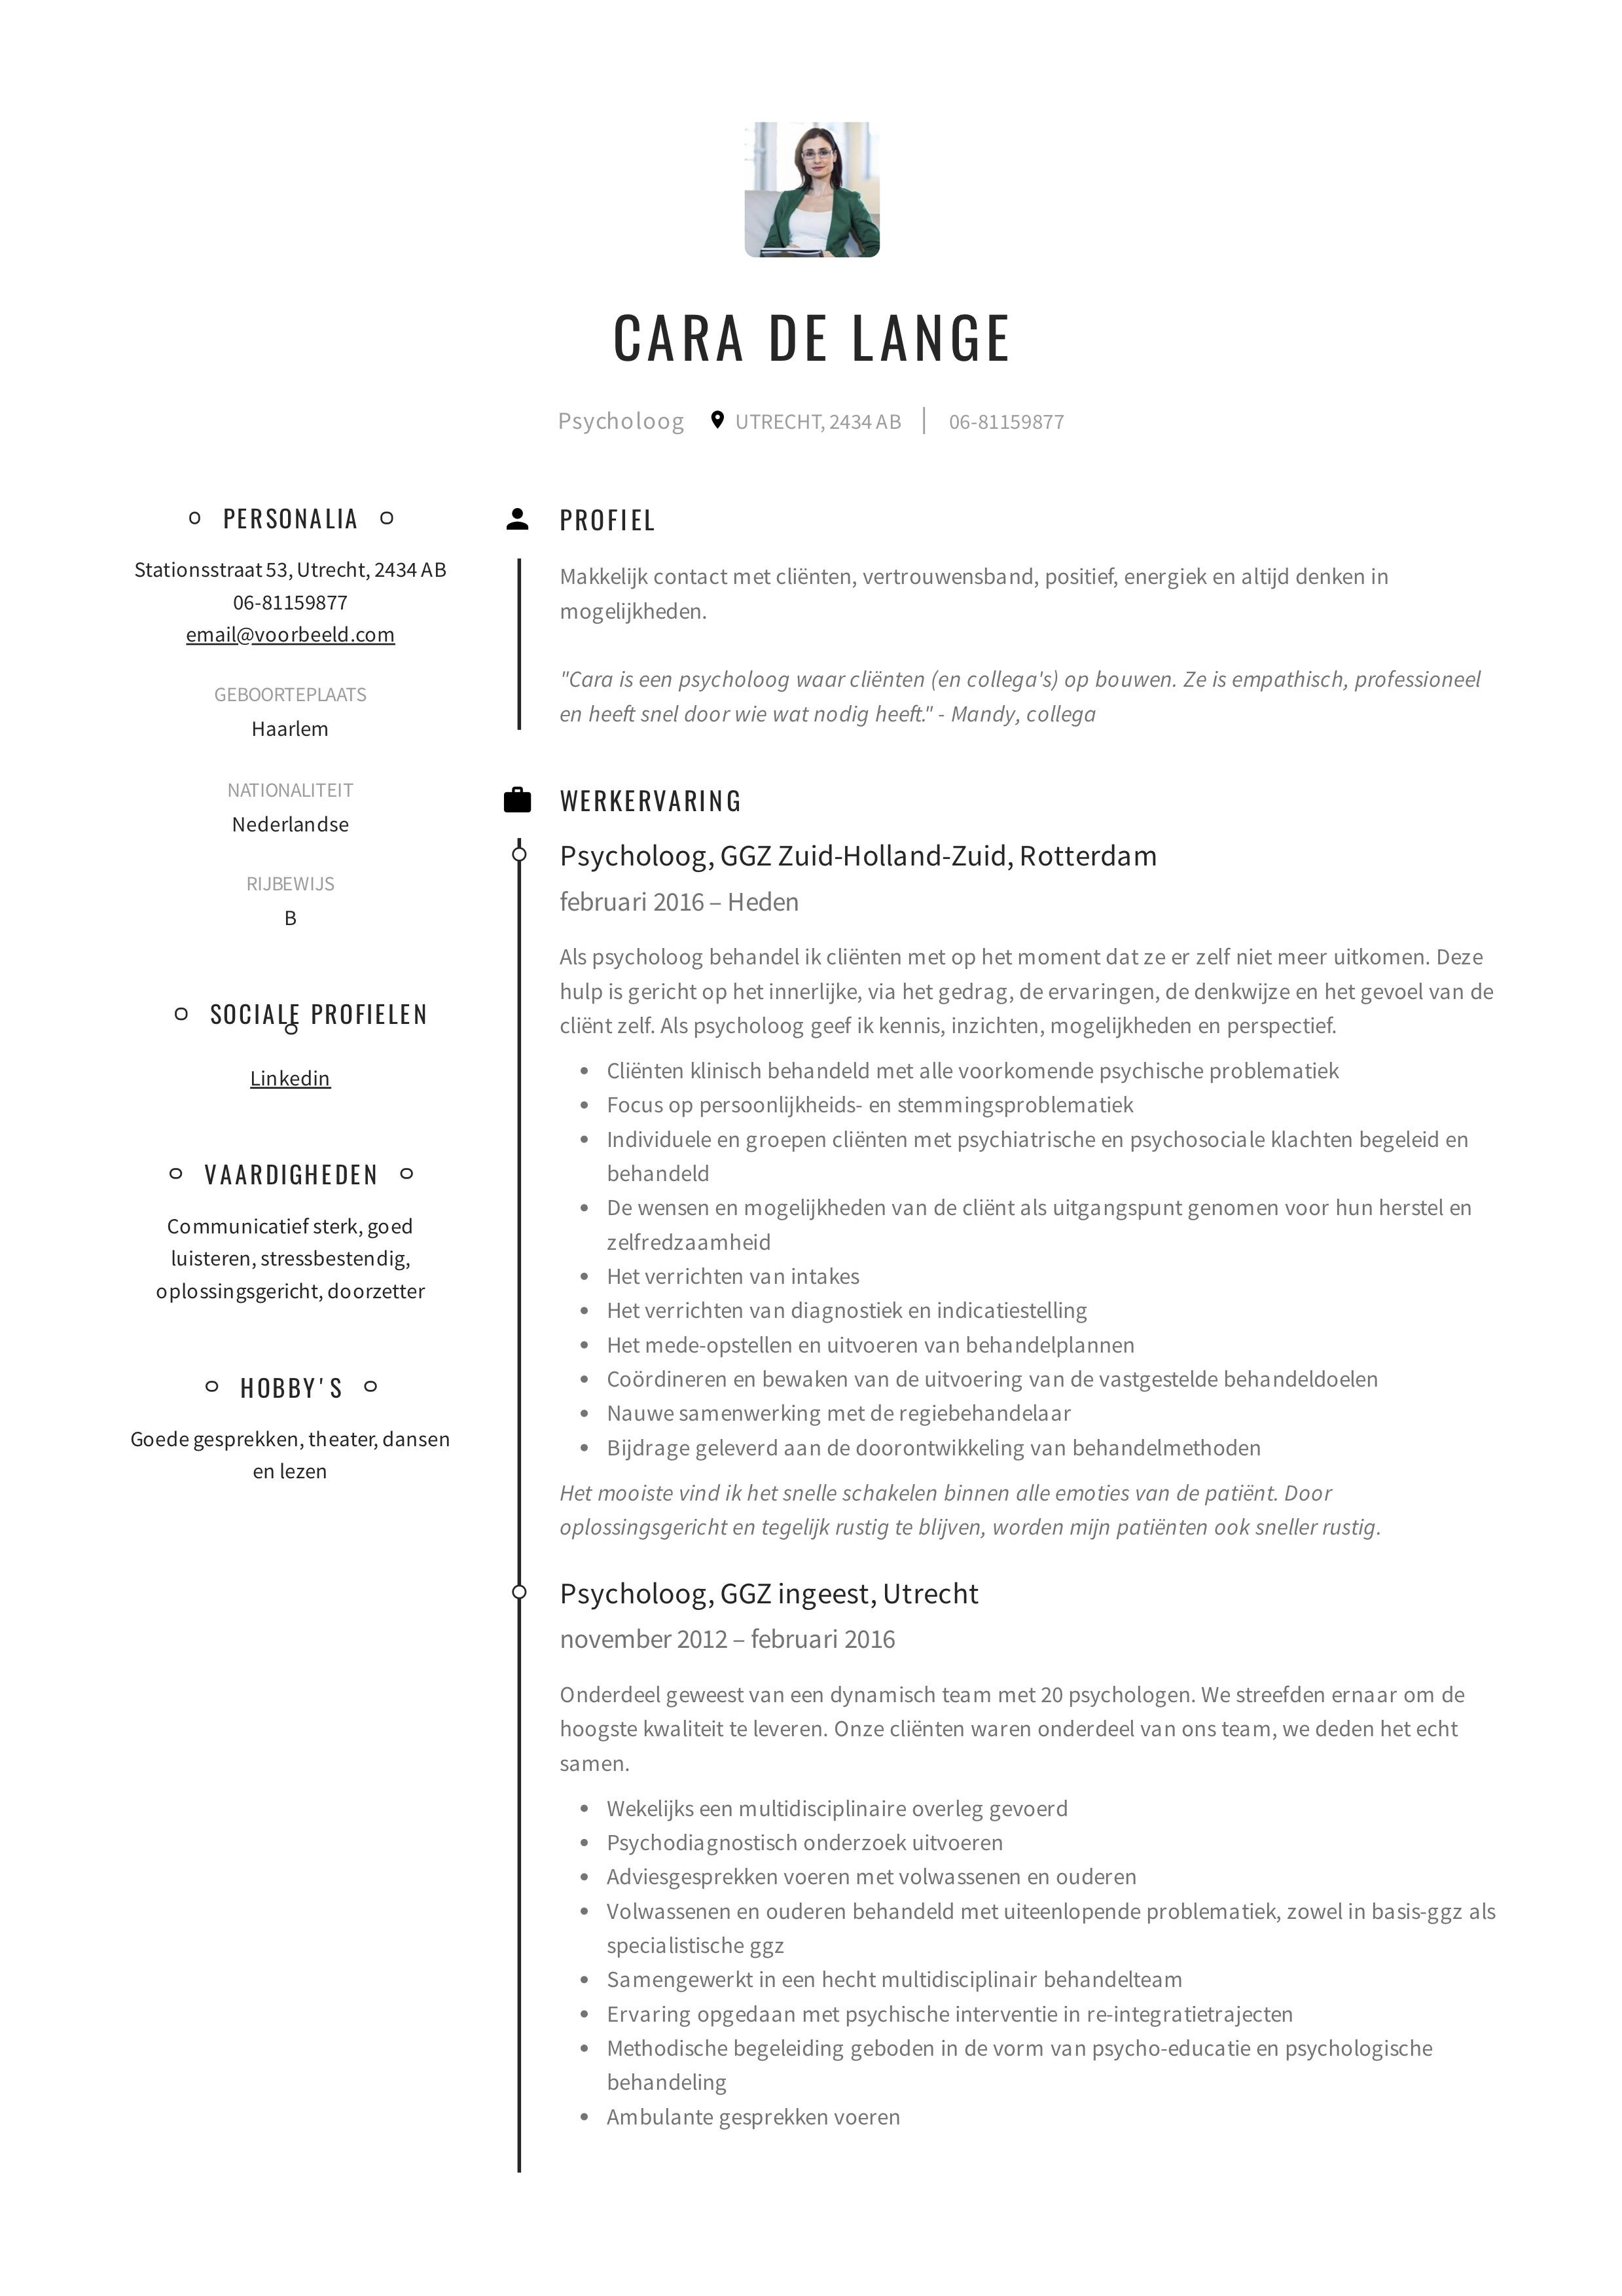 Cara_de_Lange_-_CV_-_Psycholoog (1)